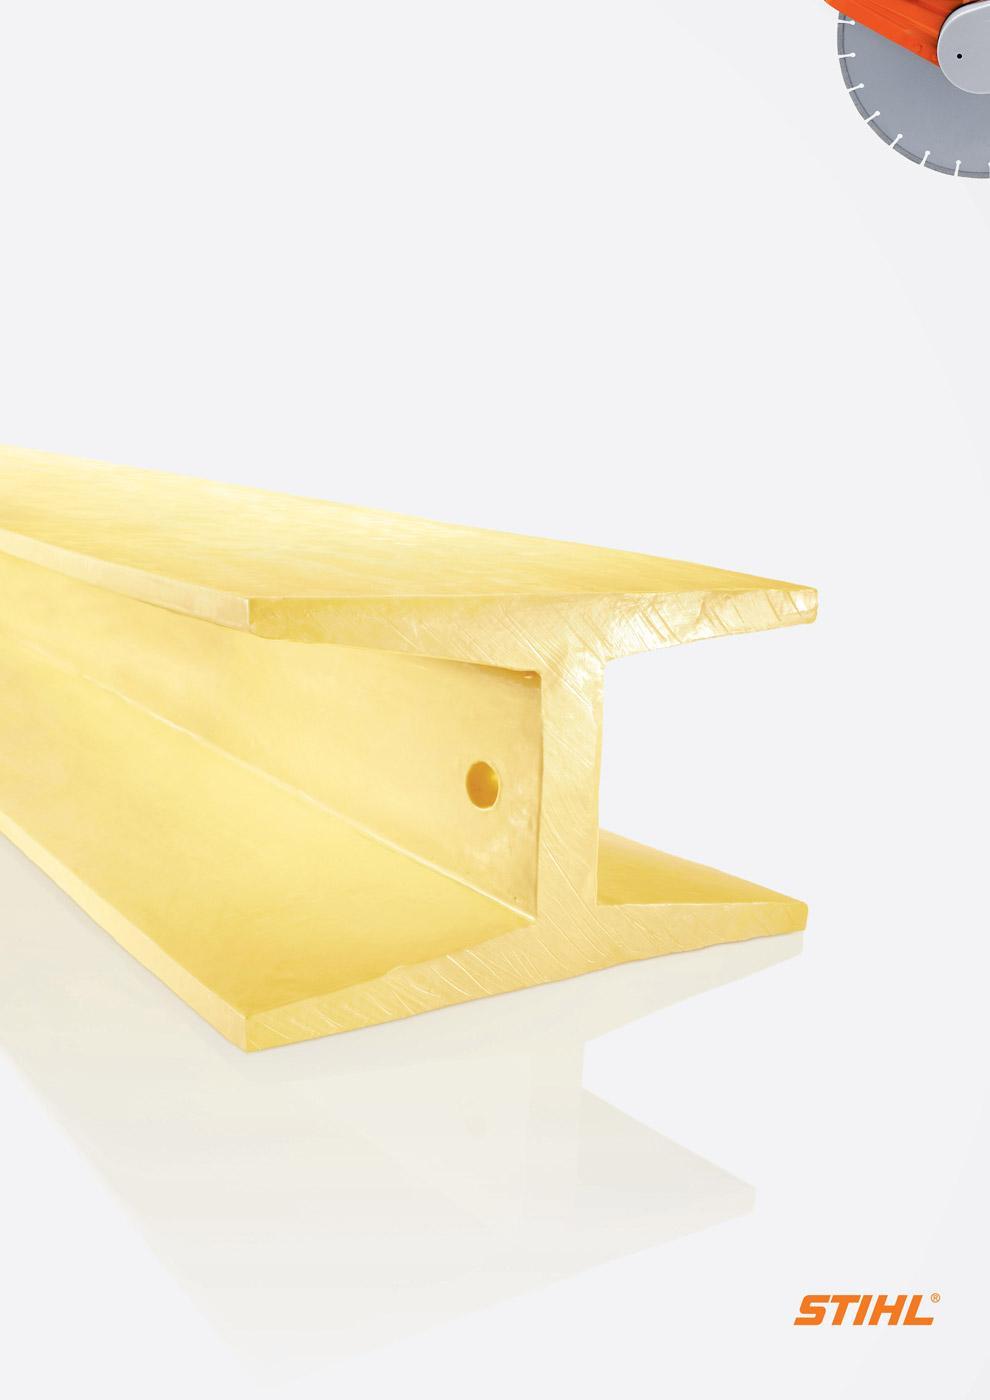 Stihl Print Ad -  Butter, 1